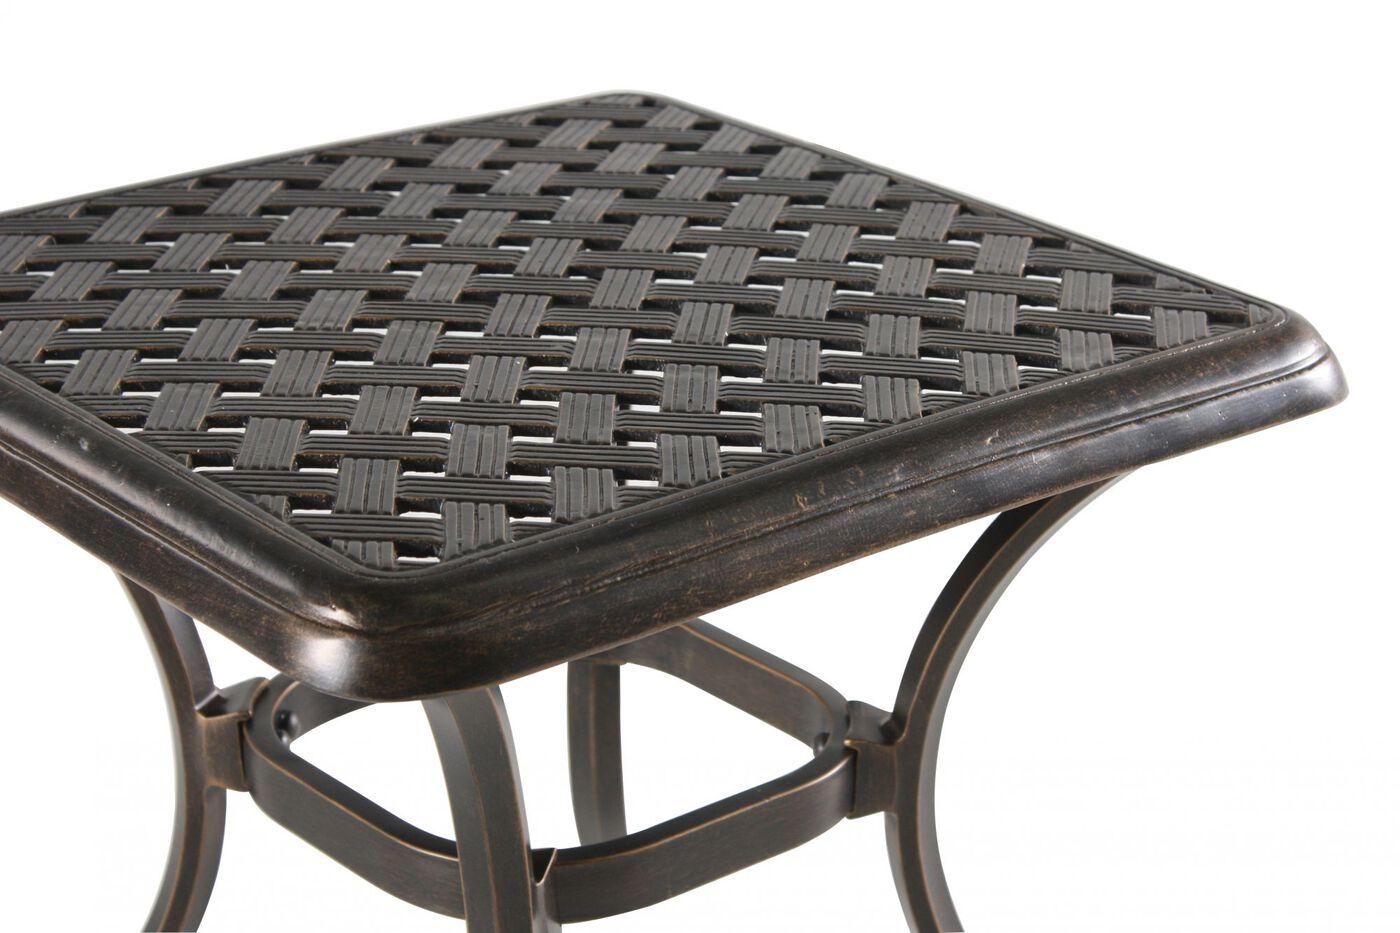 Mathis Brothers Patio Furniture agio heritage select square end table | mathis brothers furniture